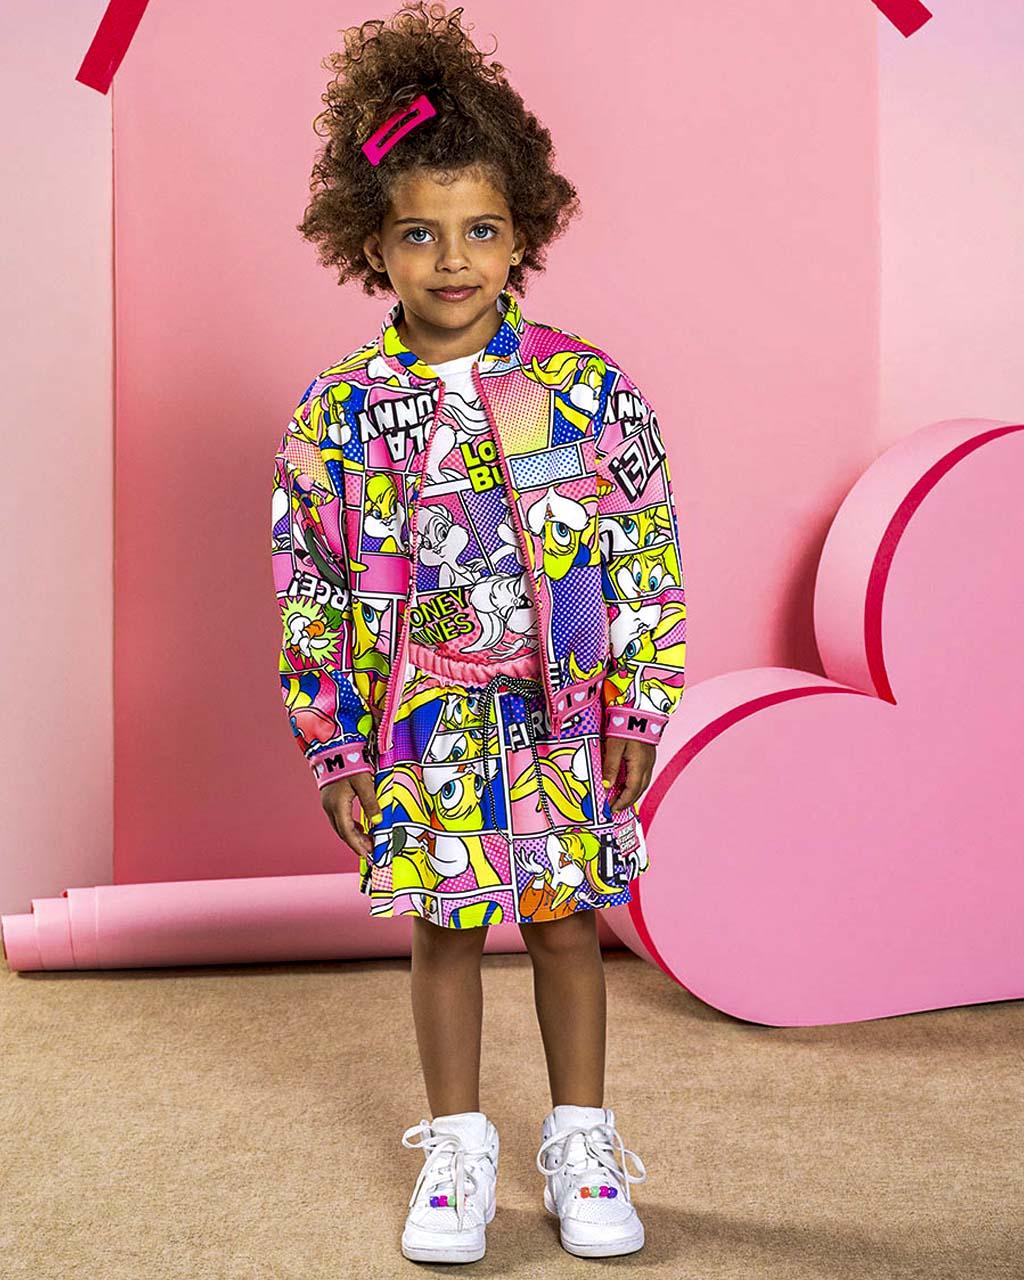 Conjunto Infantil Blusa Arte Lola e Shorts Saia Arte Lola Licenciado Animê